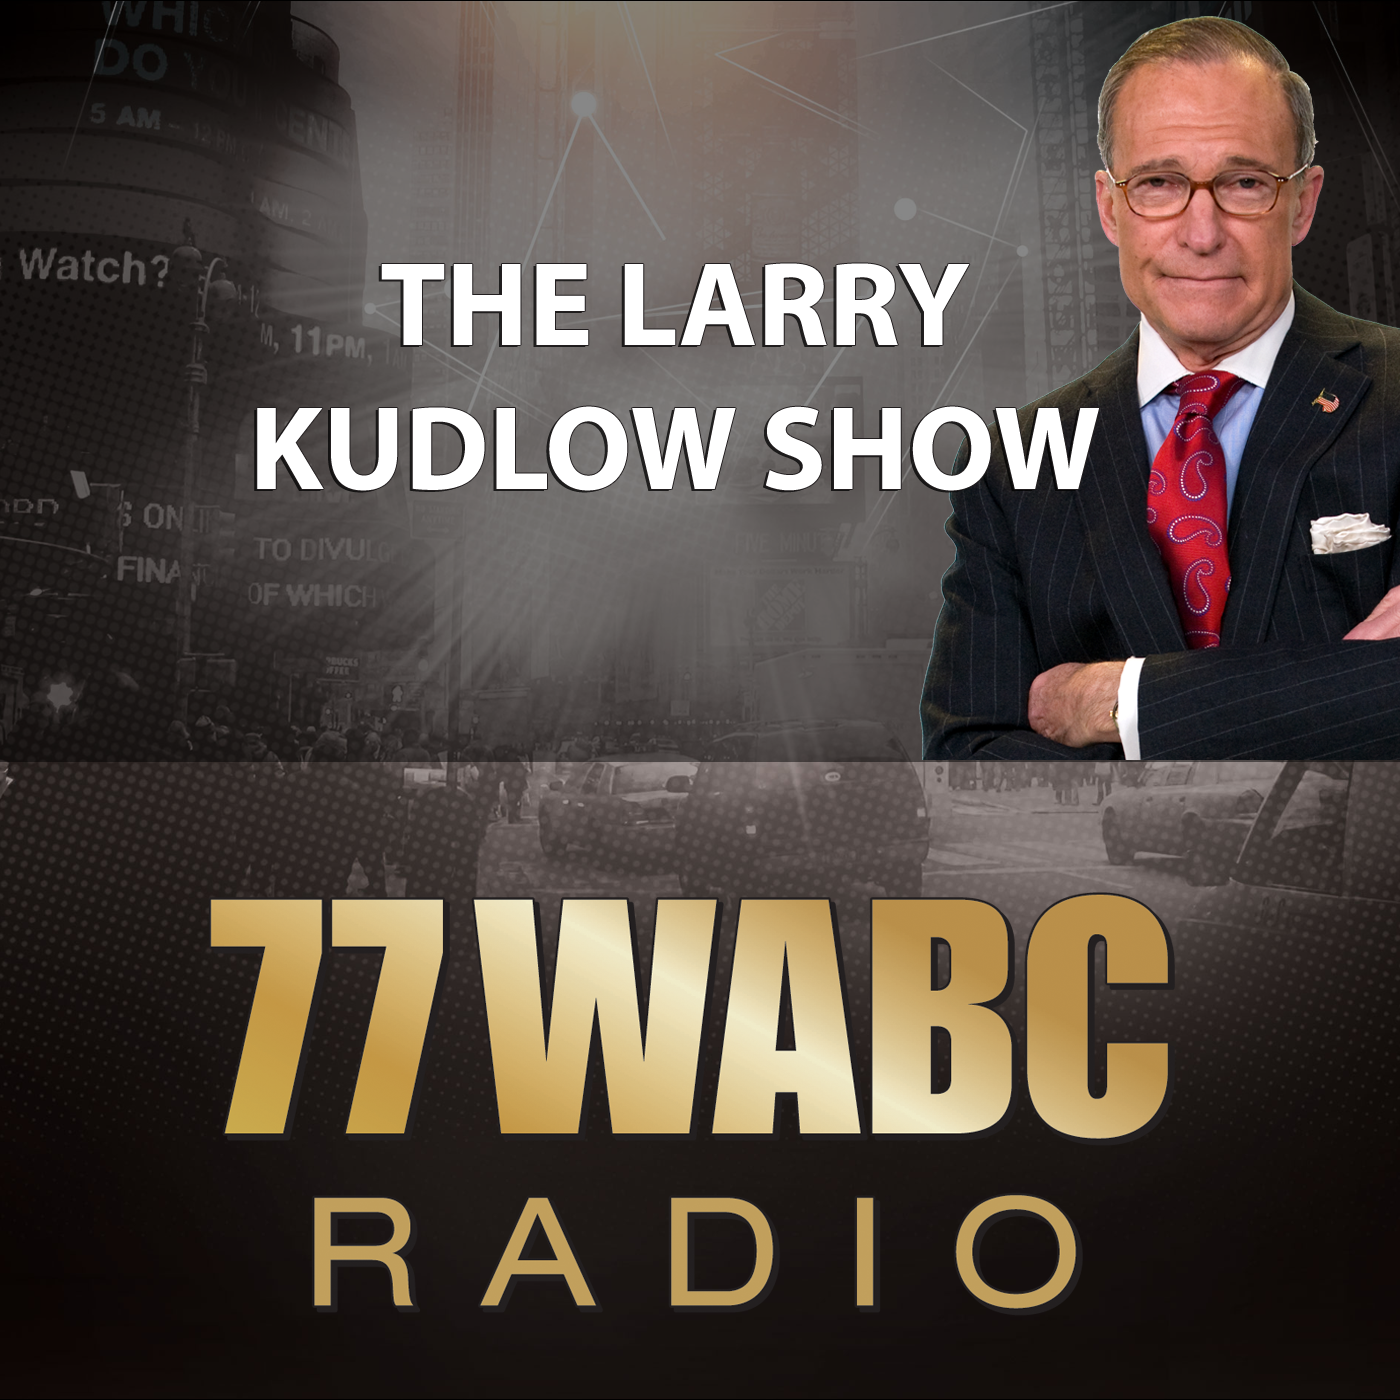 The Larry Kudlow Show on 77 WABC Radio